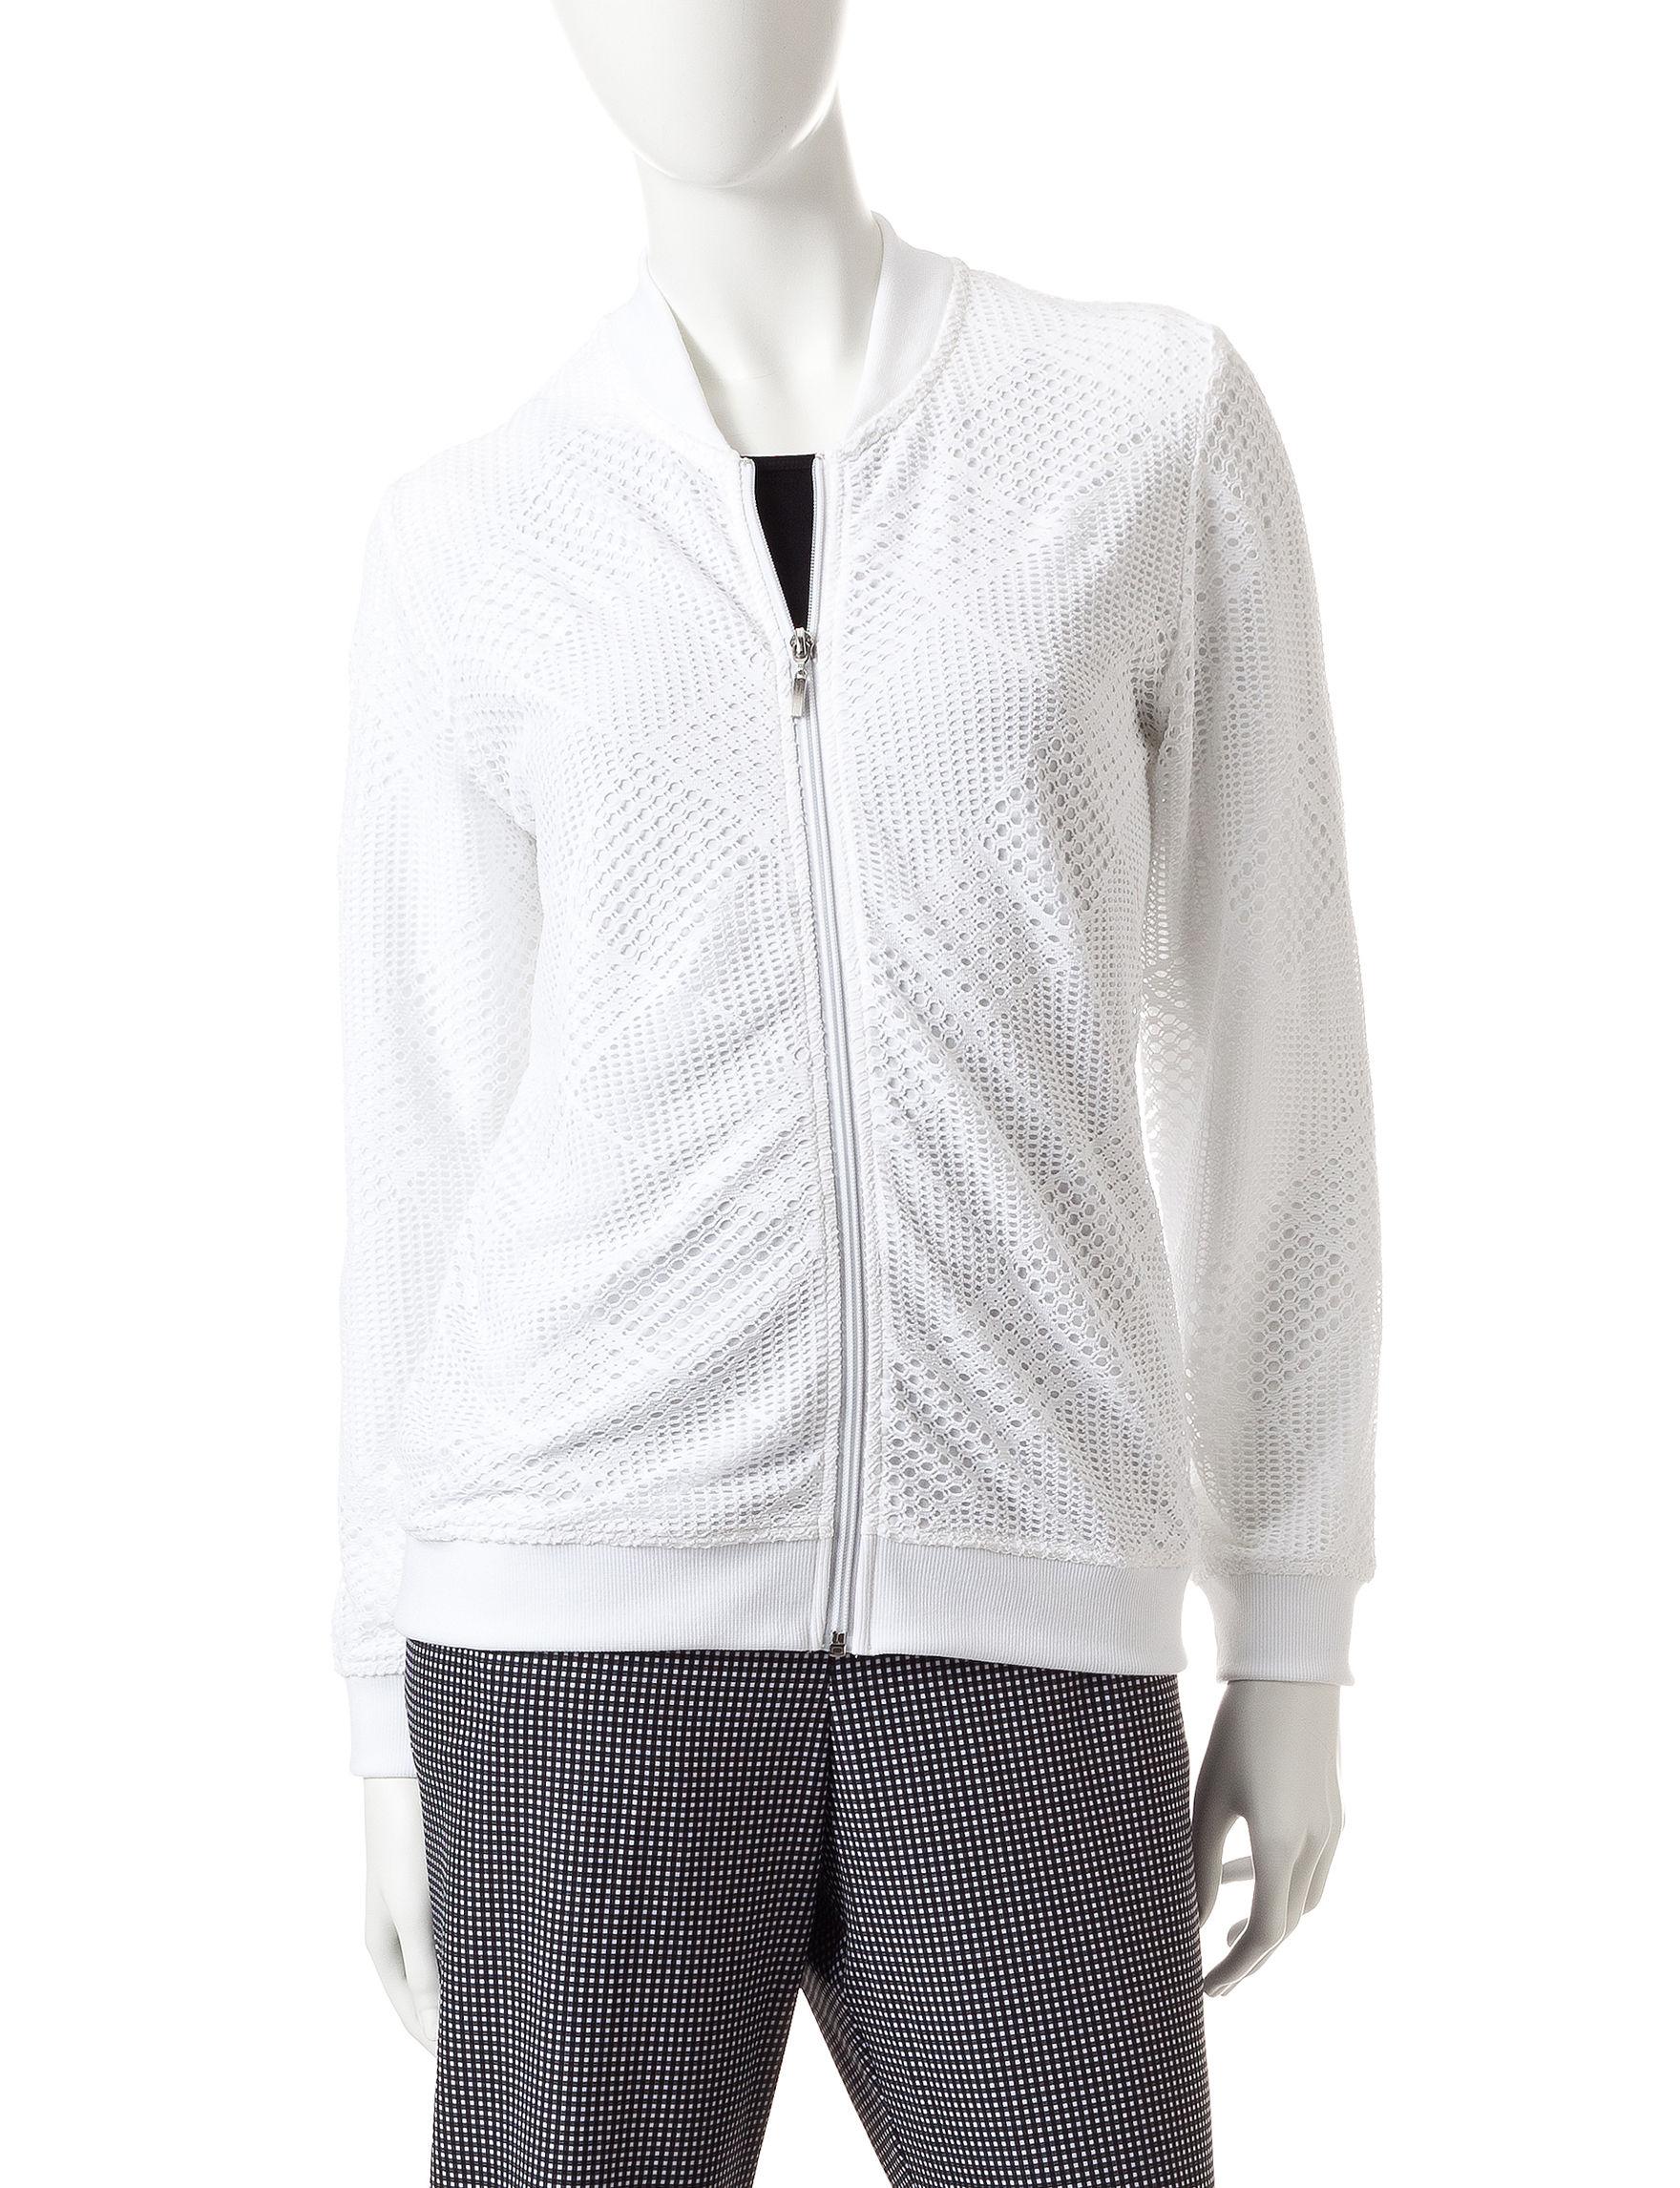 Alfred Dunner White Lightweight Jackets & Blazers